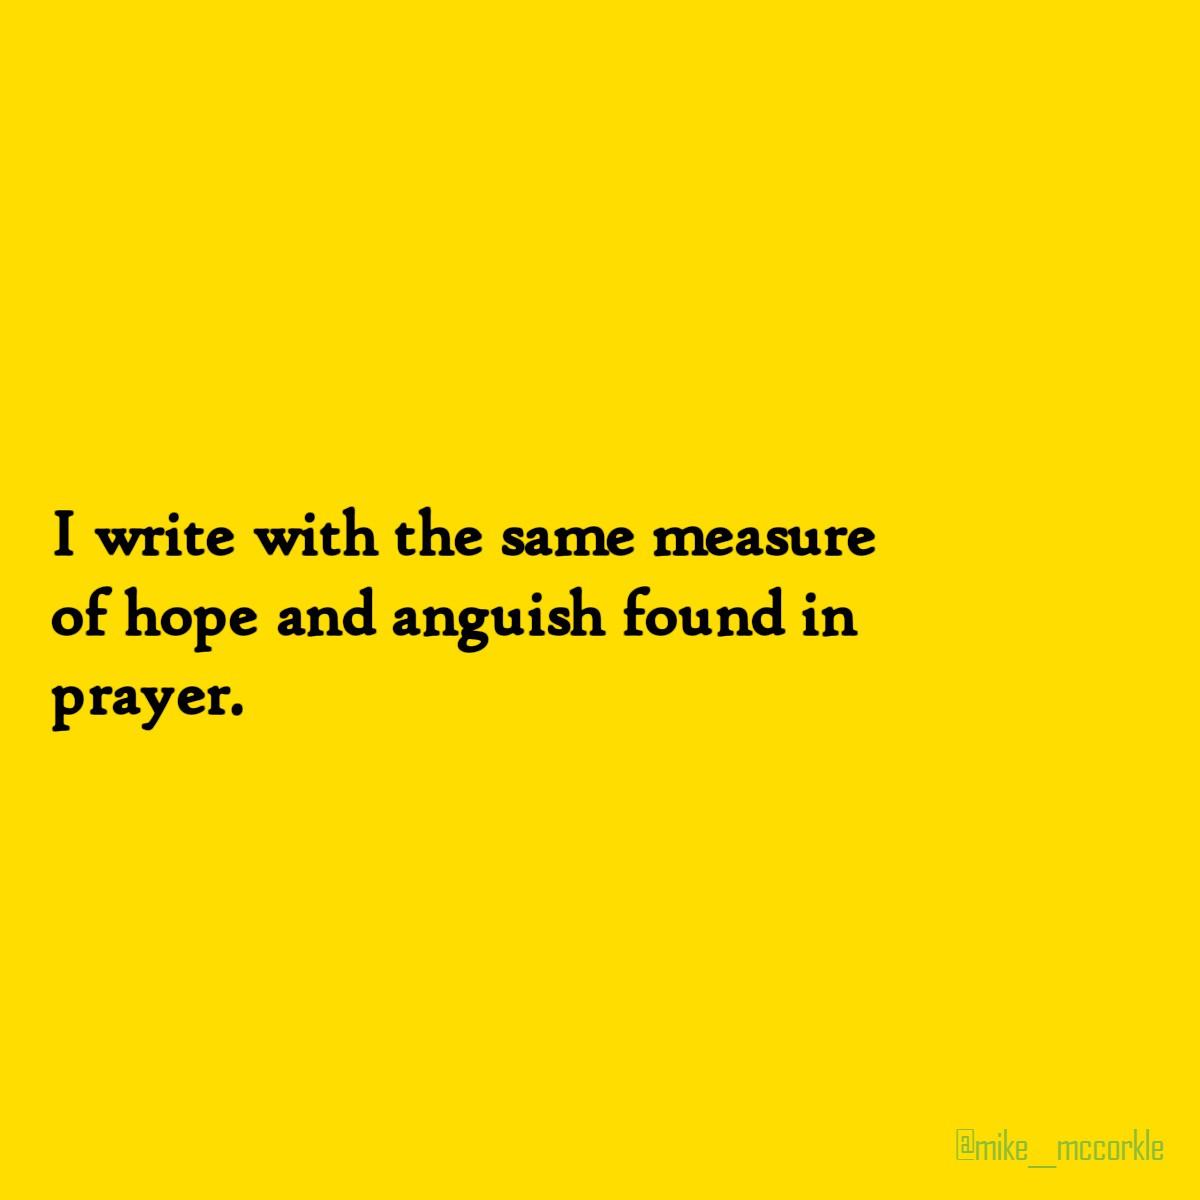 sentence 1